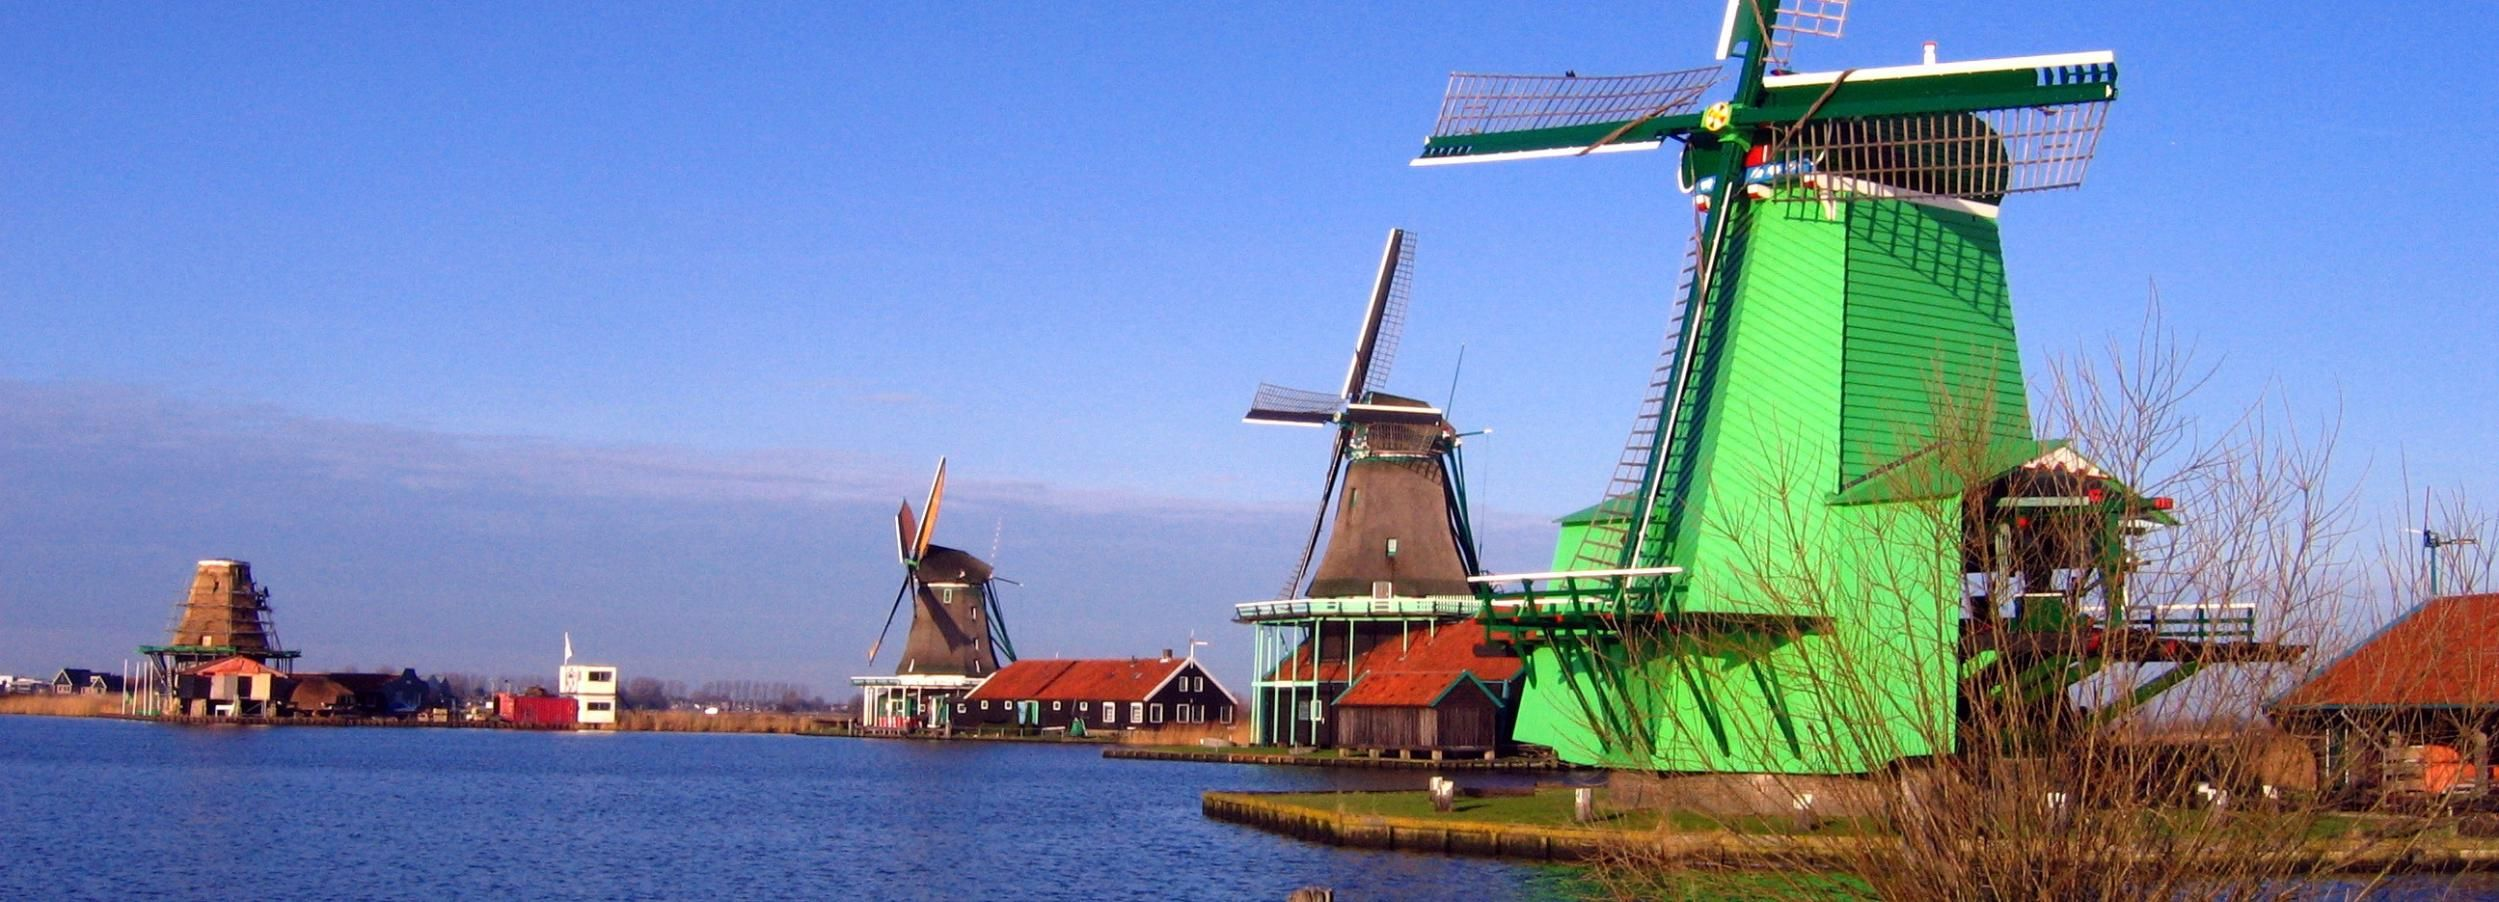 From Amsterdam: Small Group Zaanse Schans and Volendam Tour